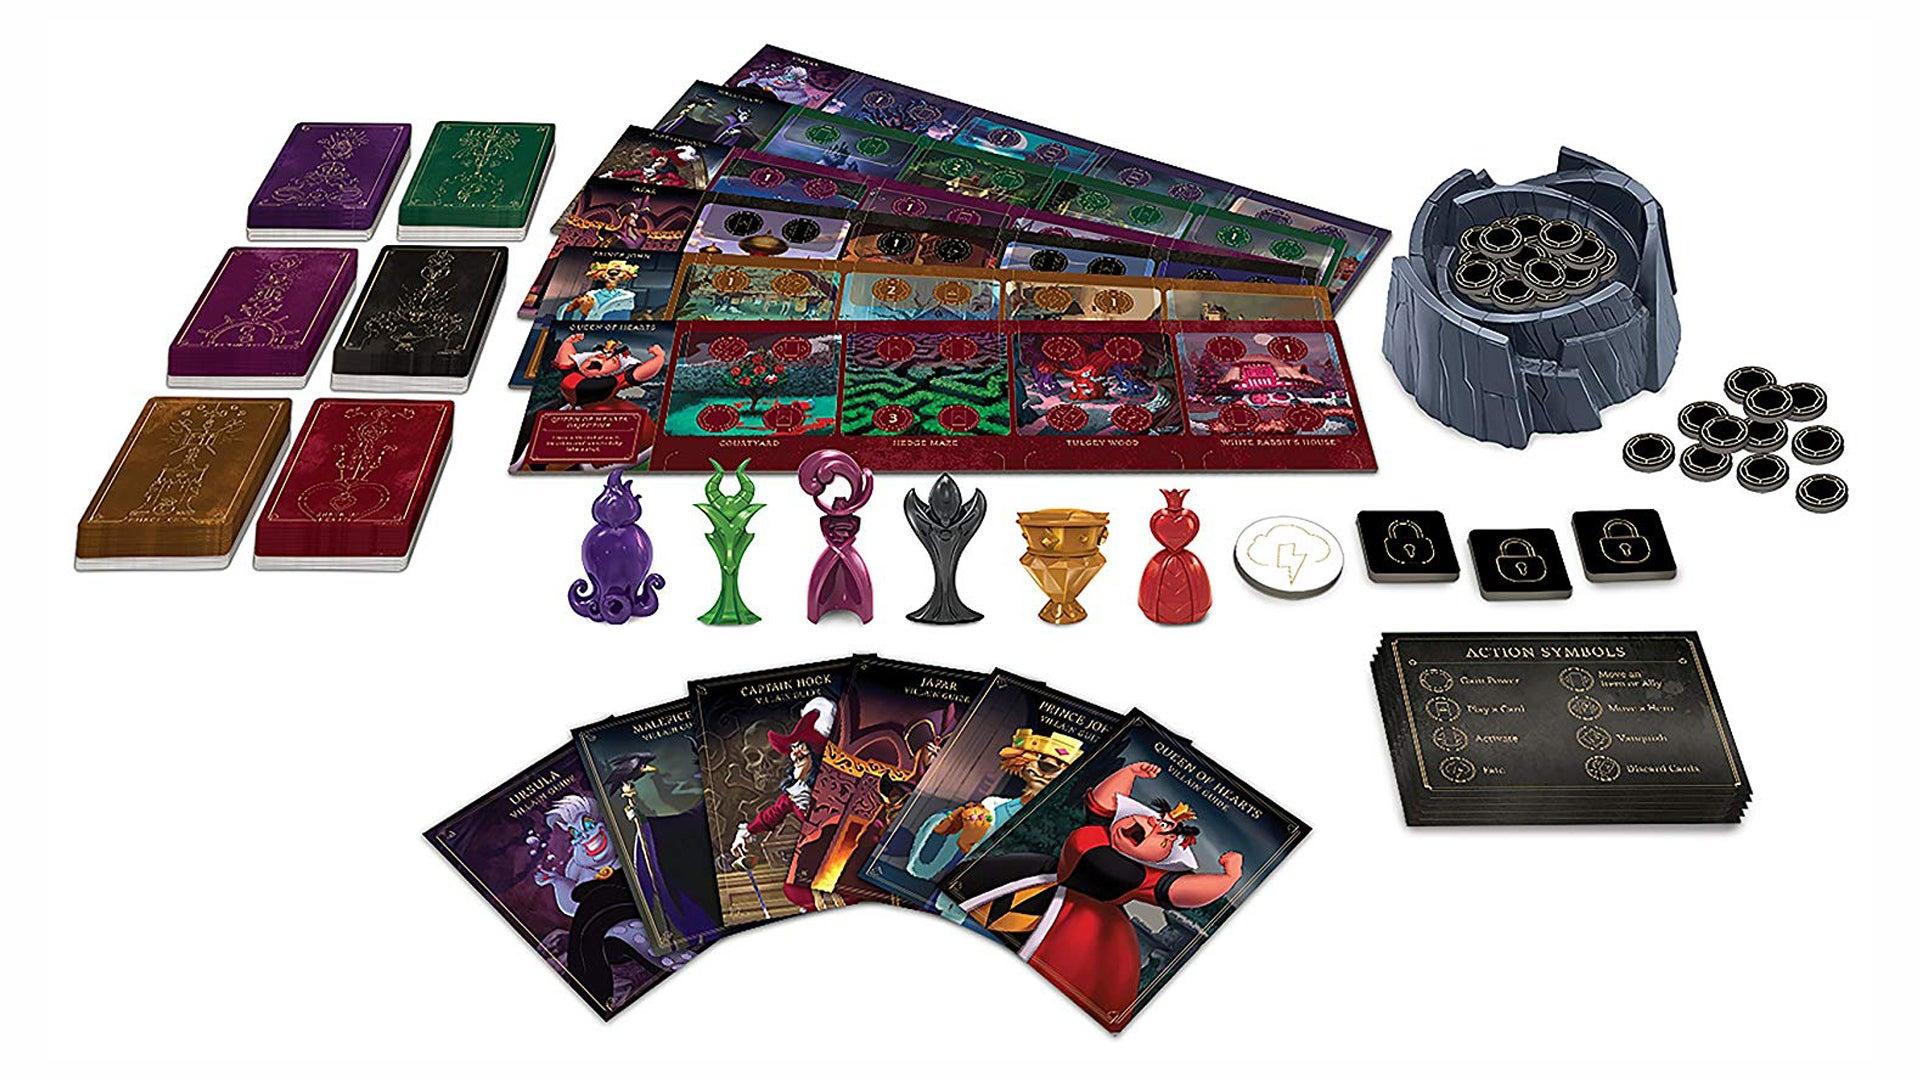 Disney Villainous board game layout